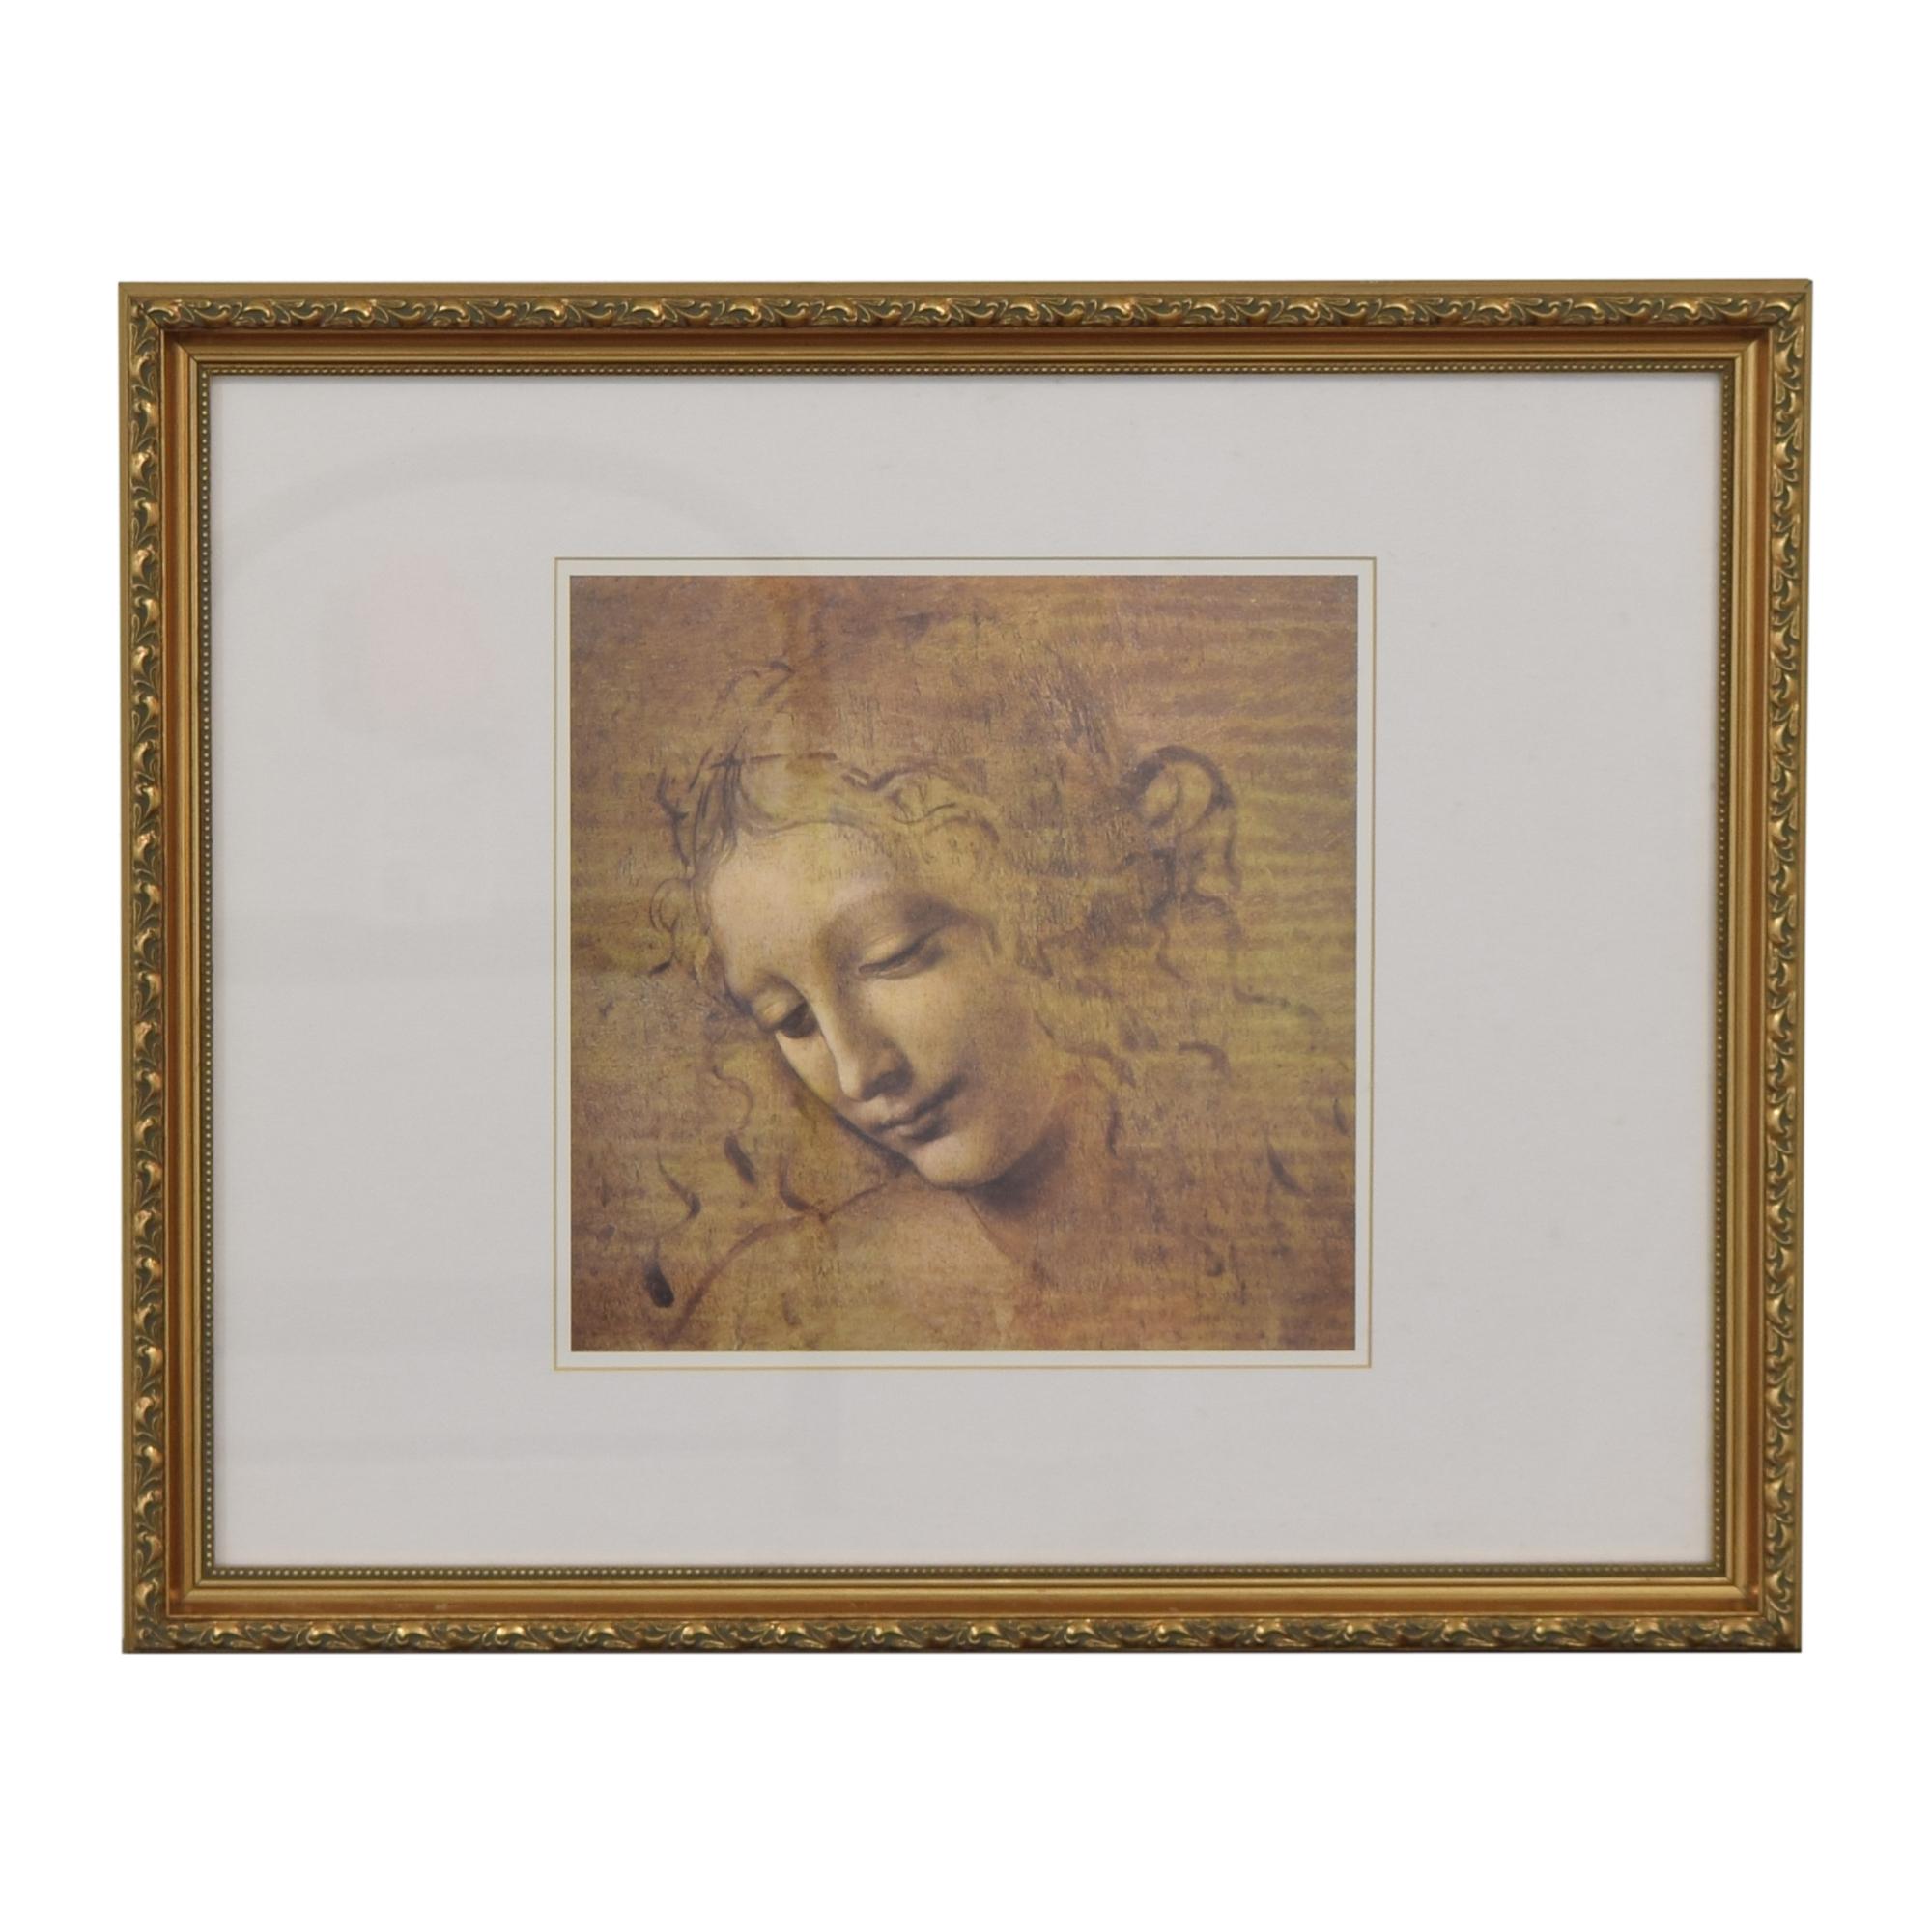 Framed La Scapaliata Da Vinci Wall Art nj